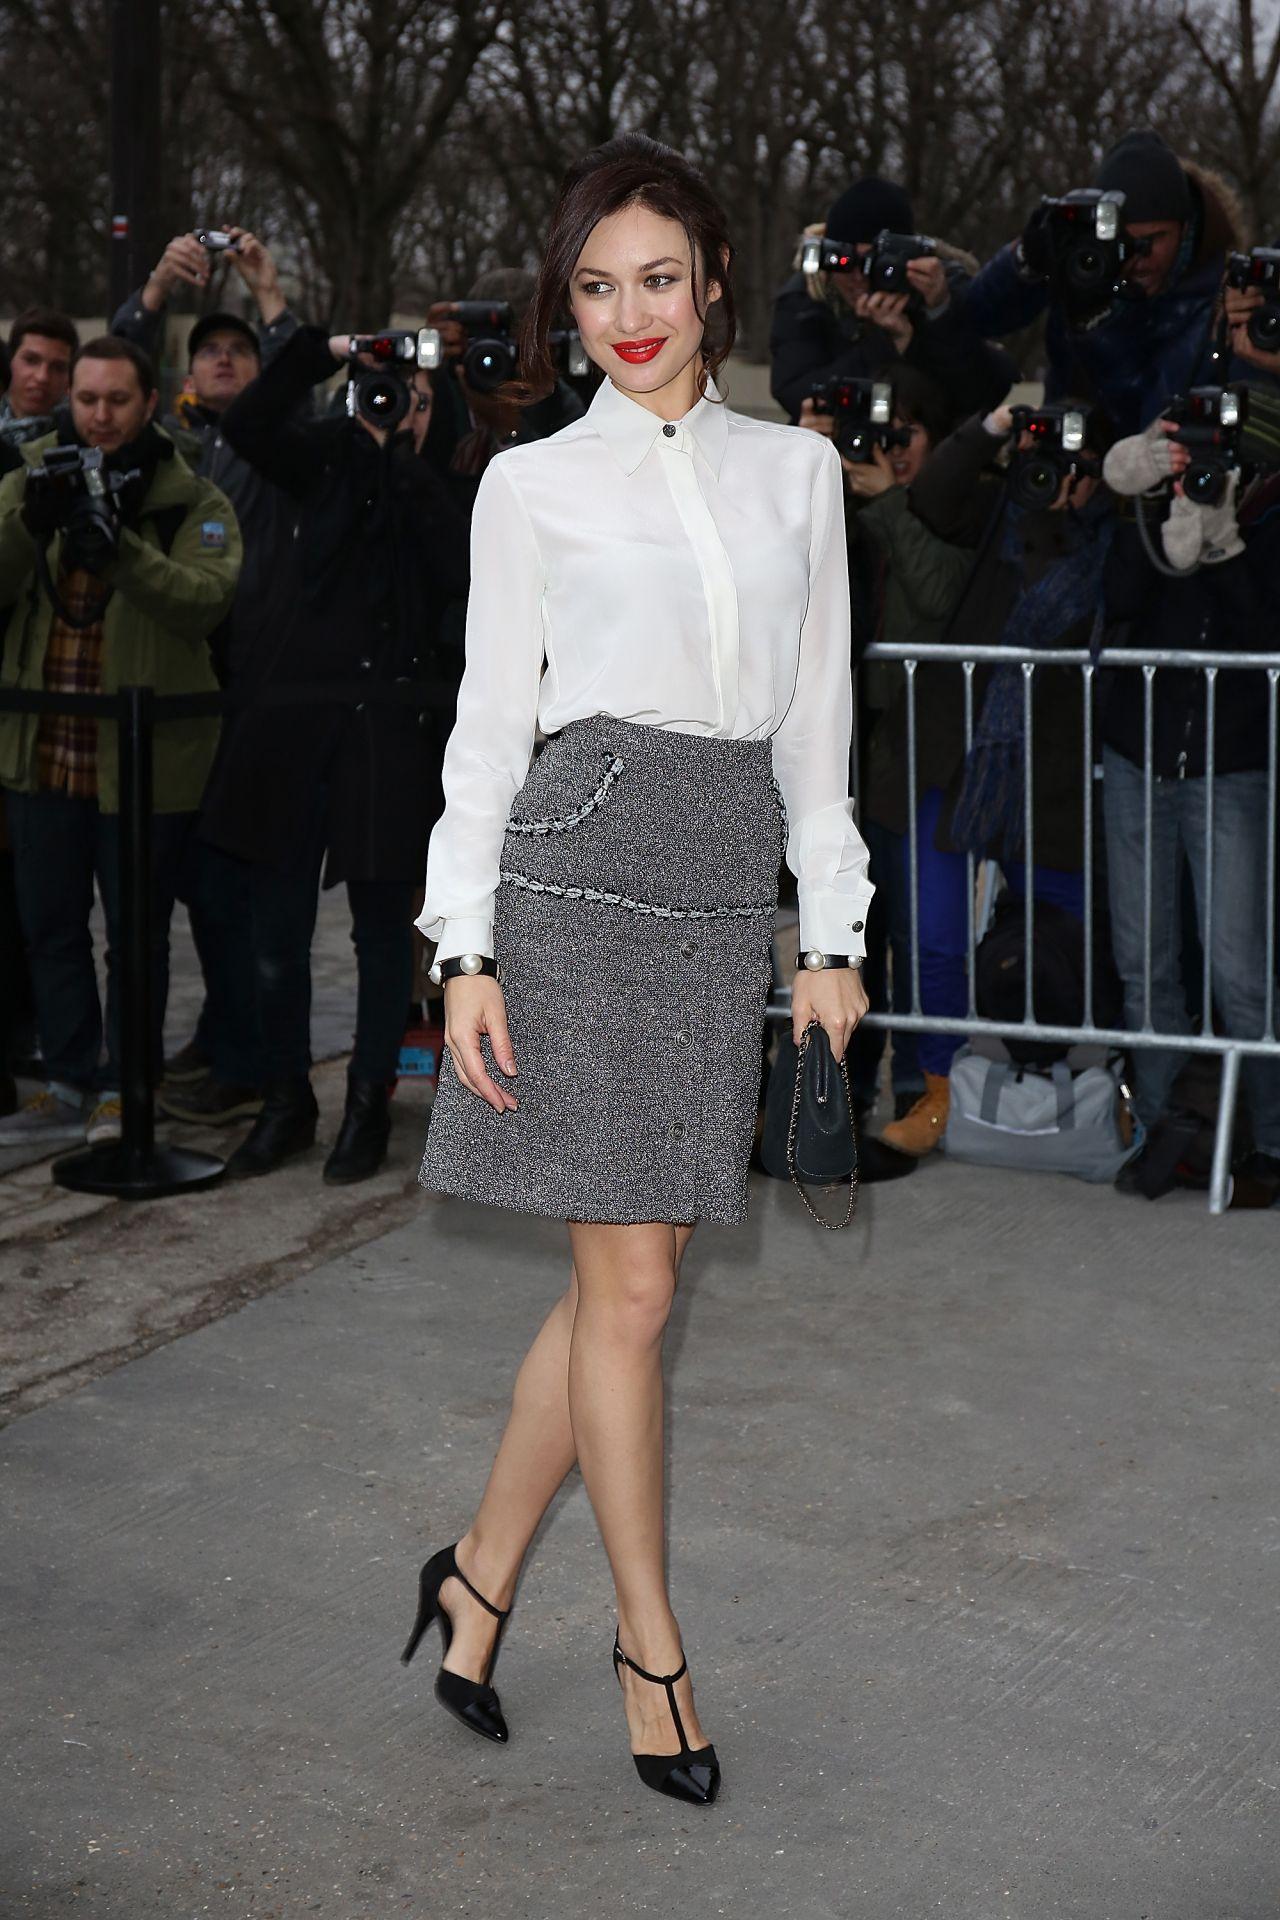 Olga Kurylenko At Chanel Fashion Show In Paris January 2014